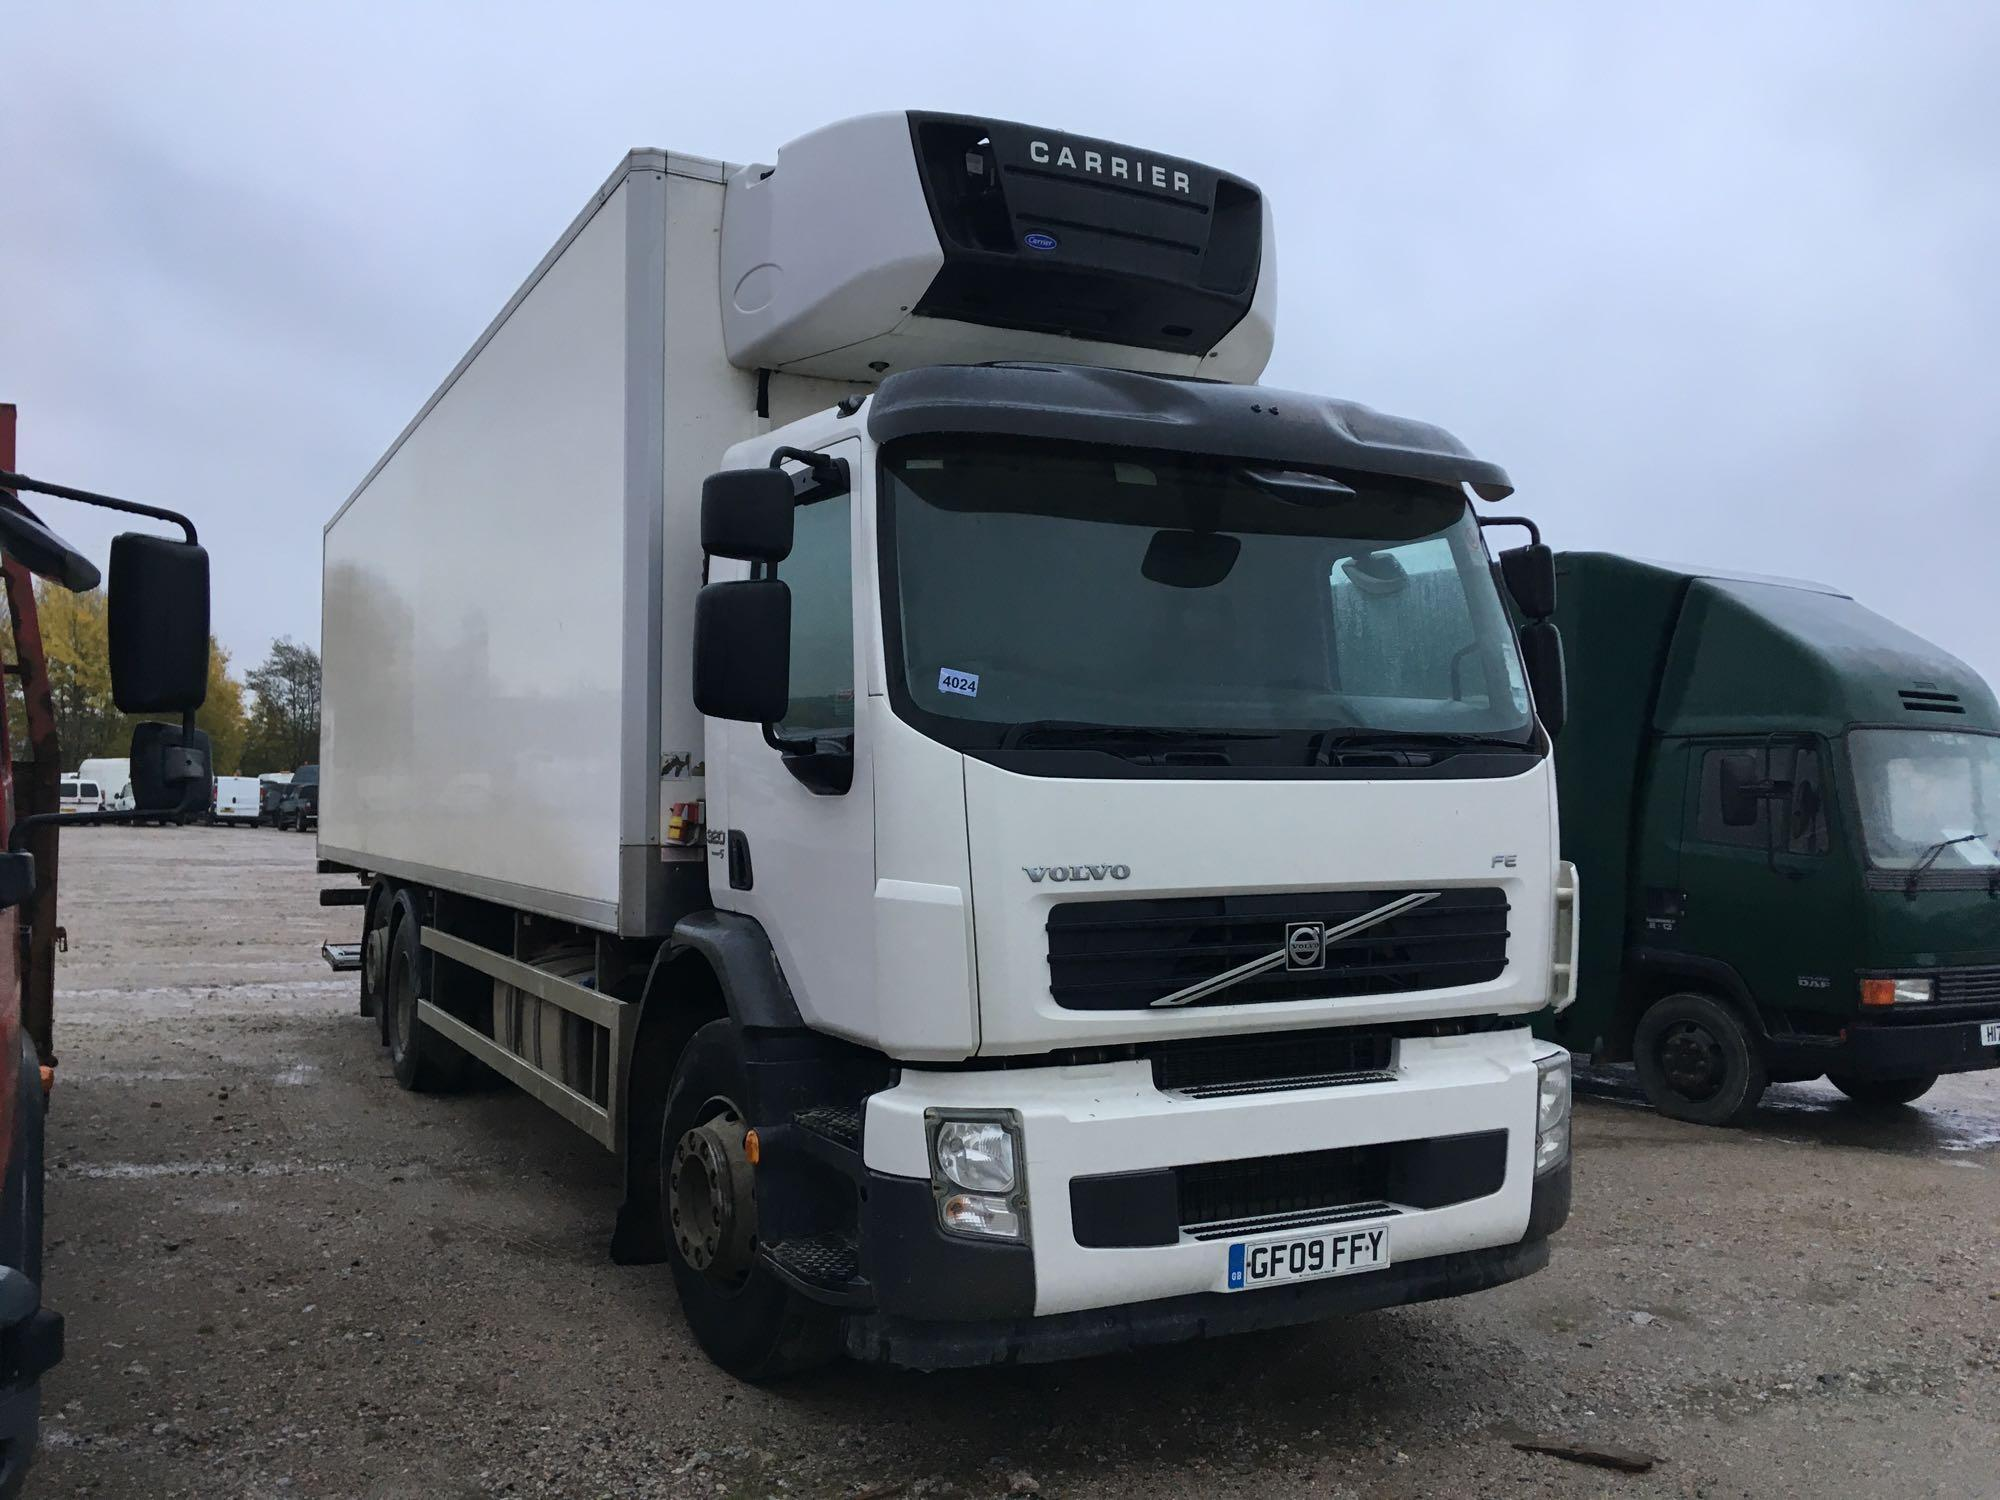 Lot 4024 - Volvo Fe Fes/e320 6x2 L1h1 Day E5 - 7146cc 2 Door Truck